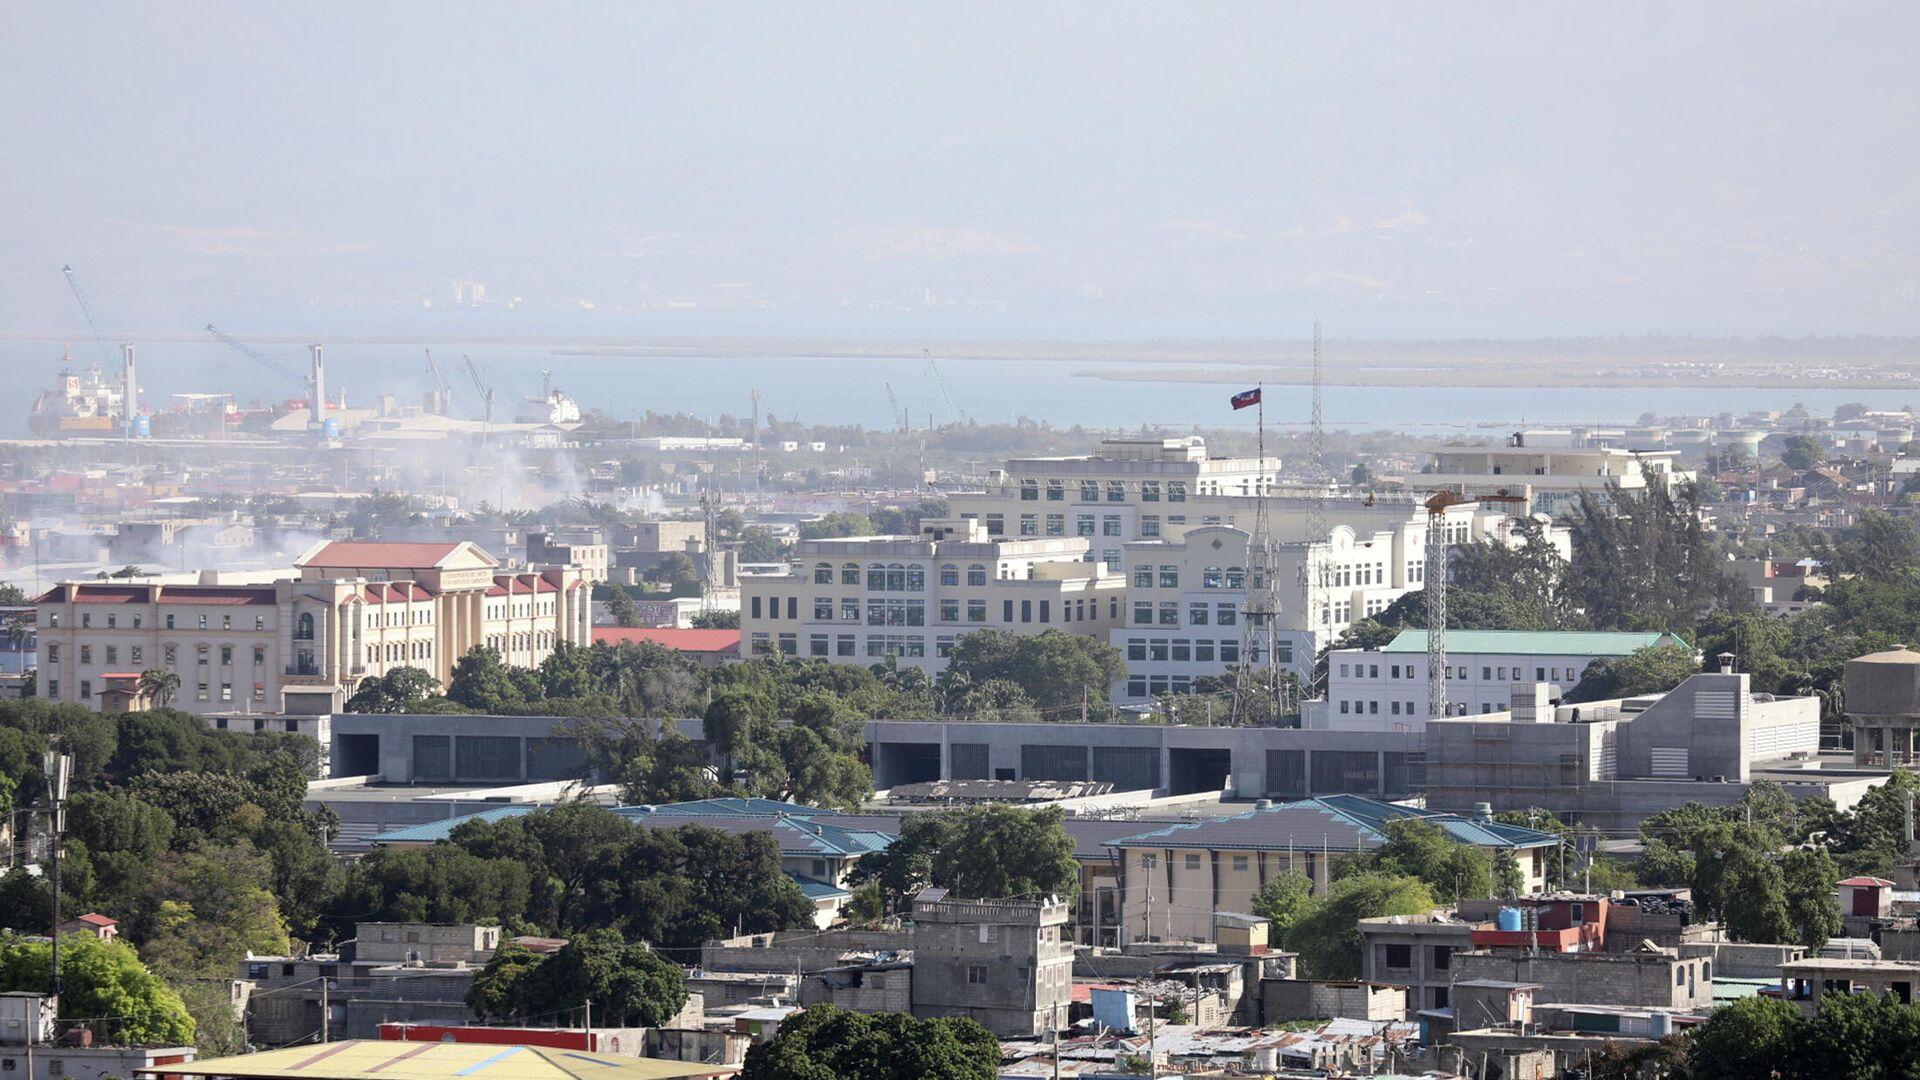 Palacio presidencial en Puerto Príncipe, Haití - Sputnik Mundo, 1920, 07.07.2021